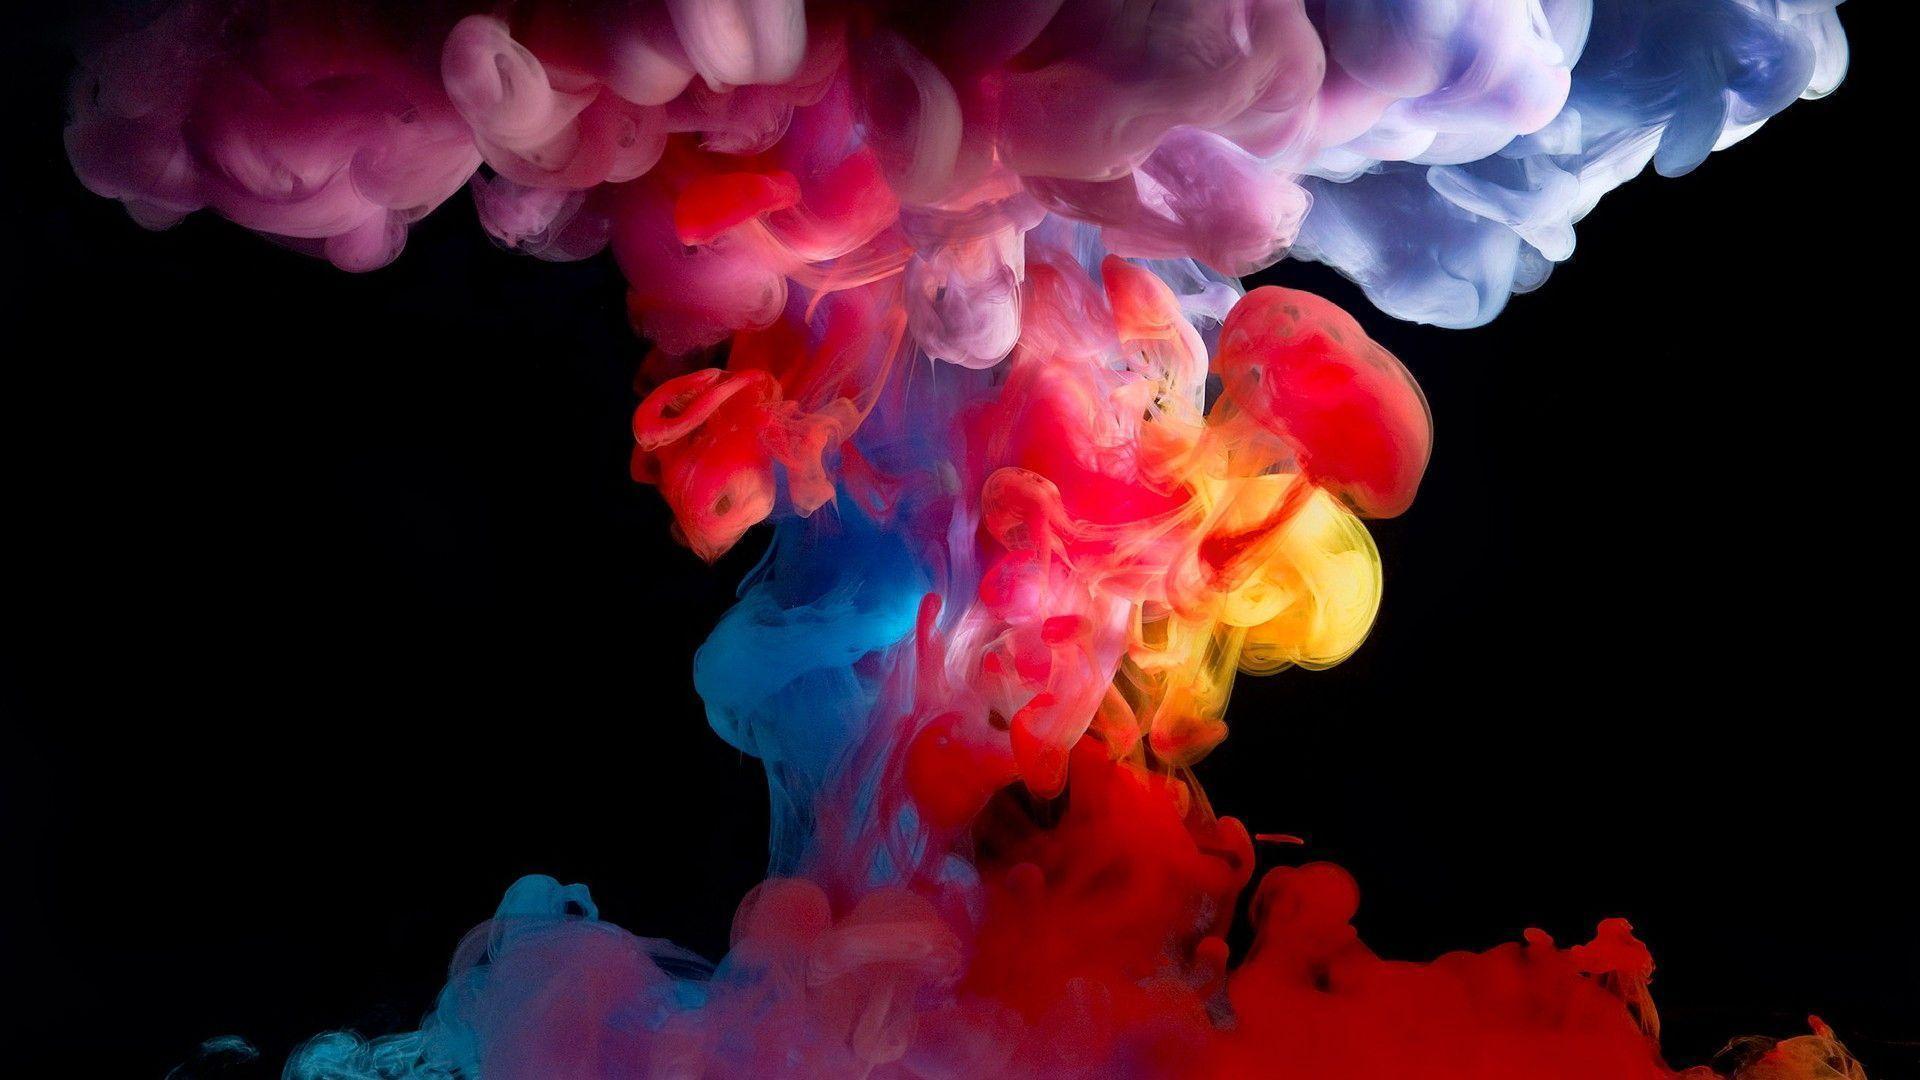 colorful smoke wallpaper designs - photo #21